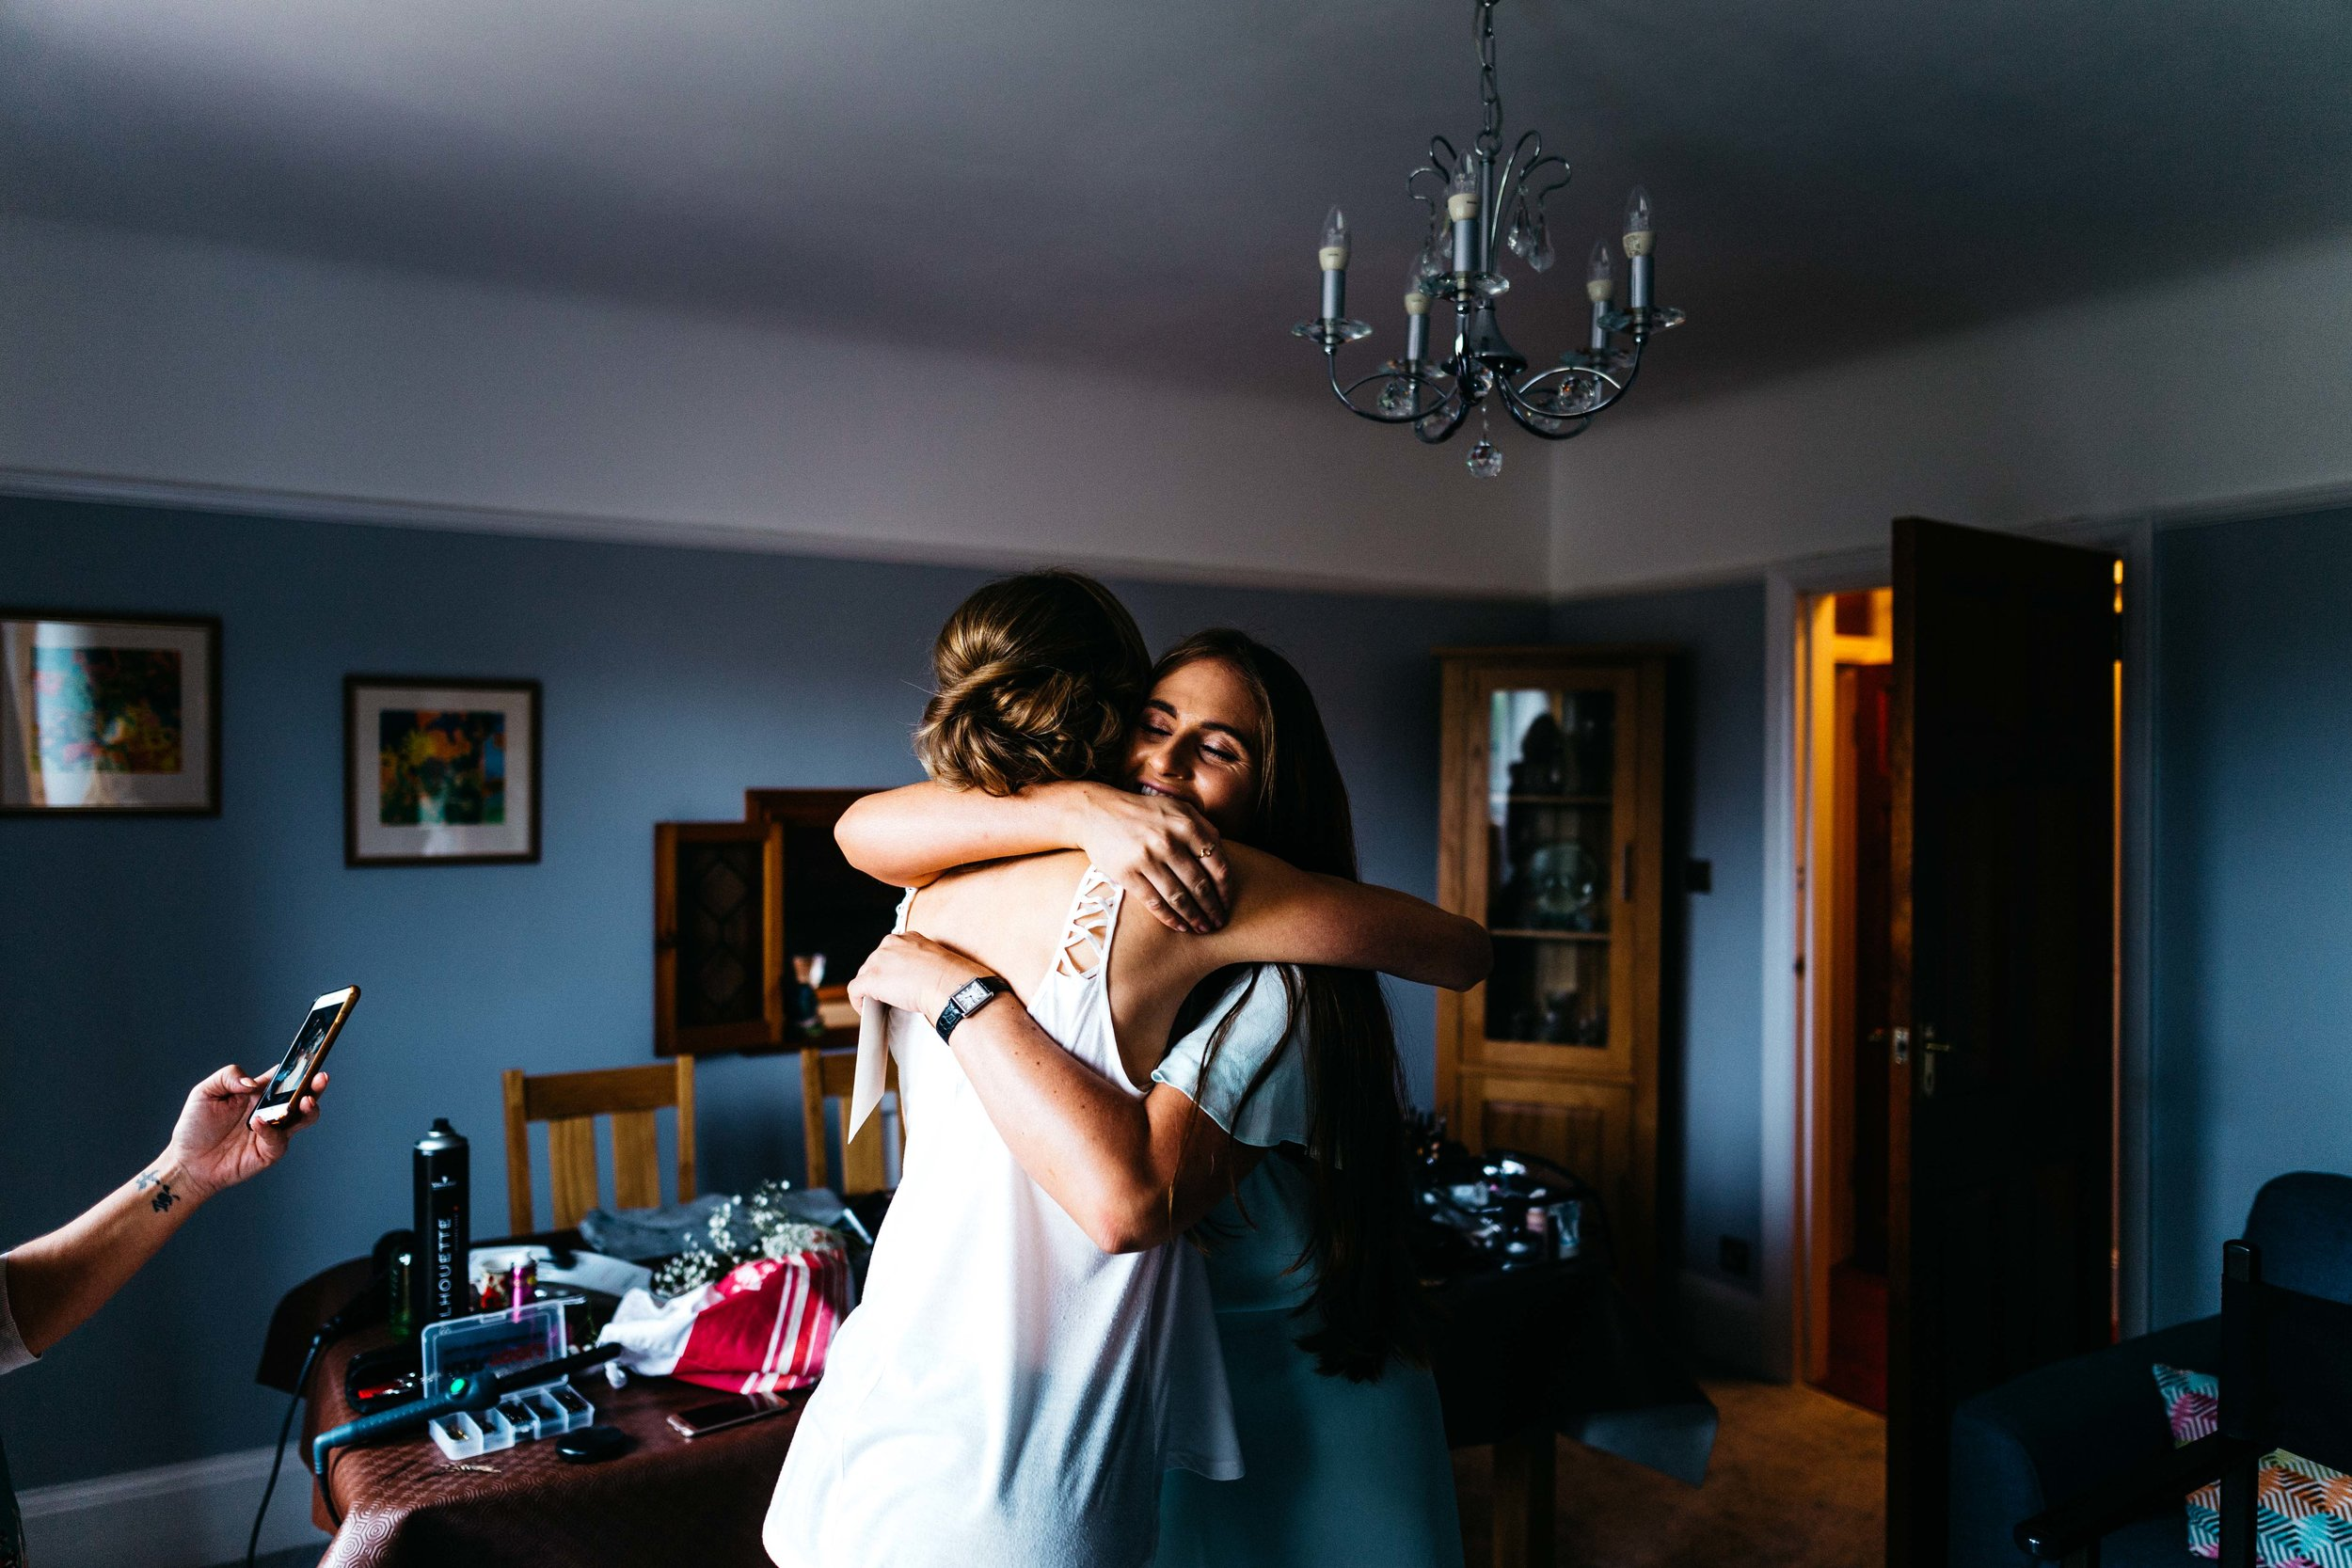 Pre-wedding hug